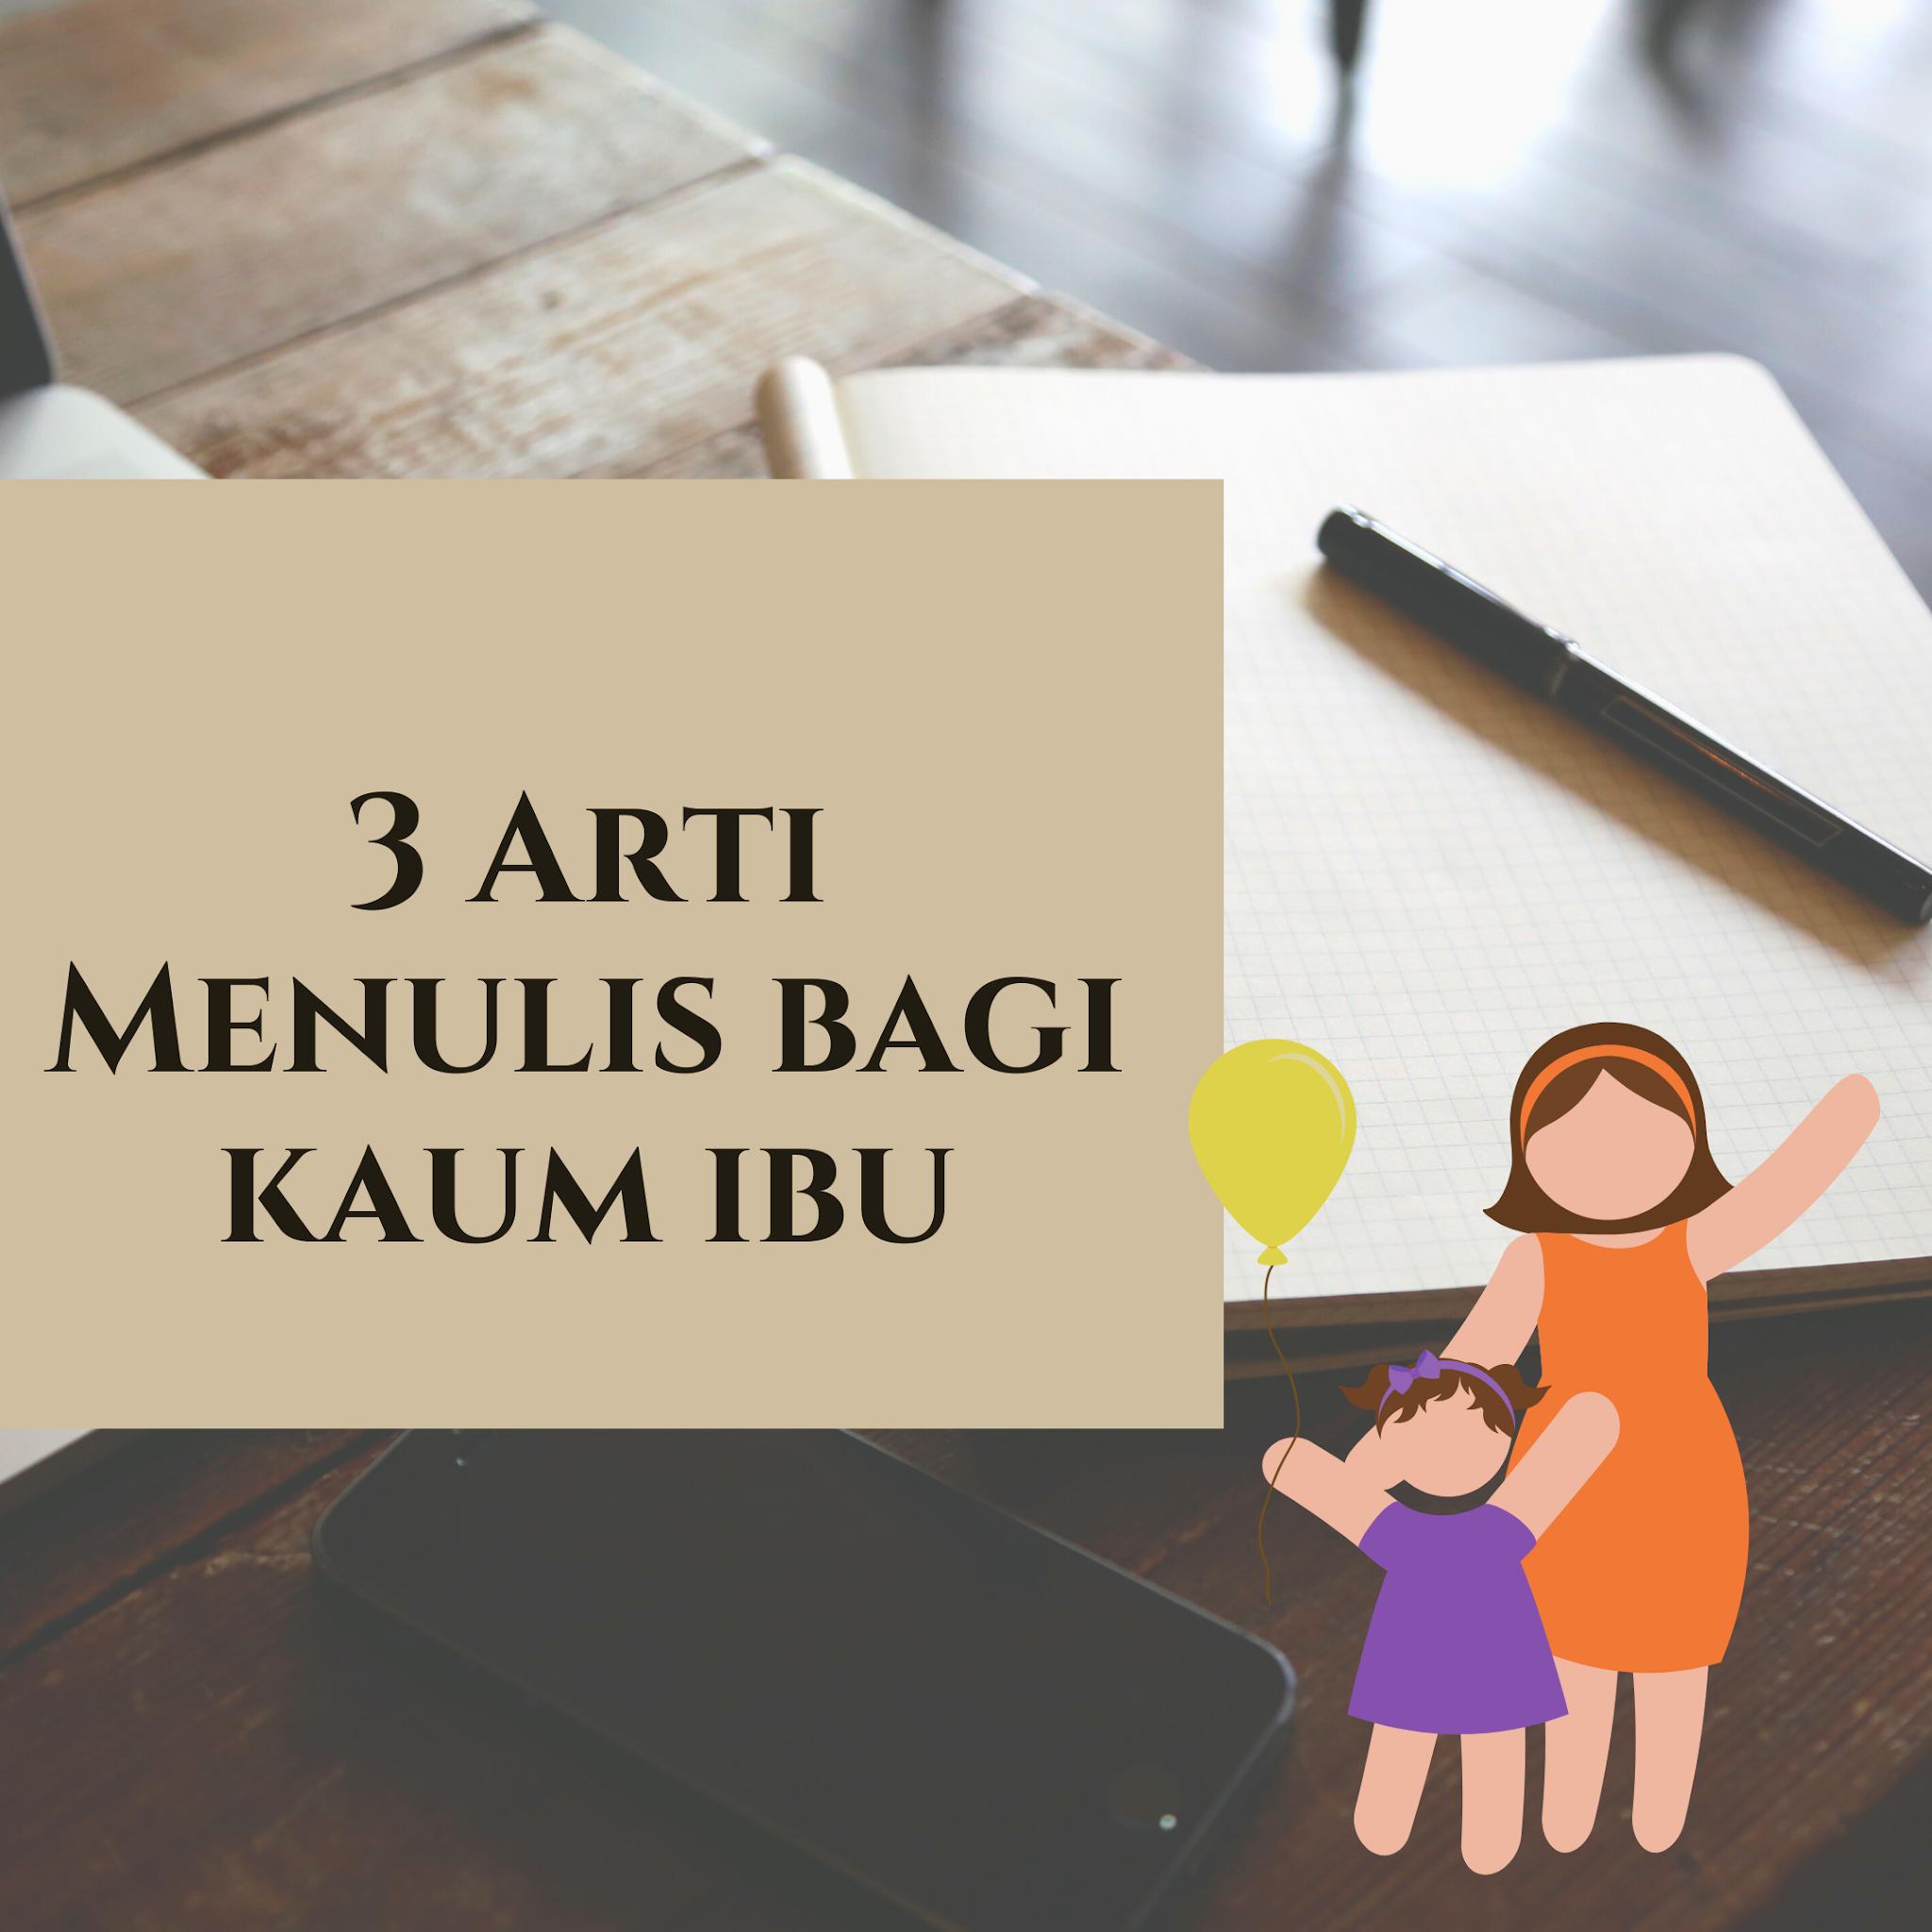 3 artie menulis bagi kaum ibu